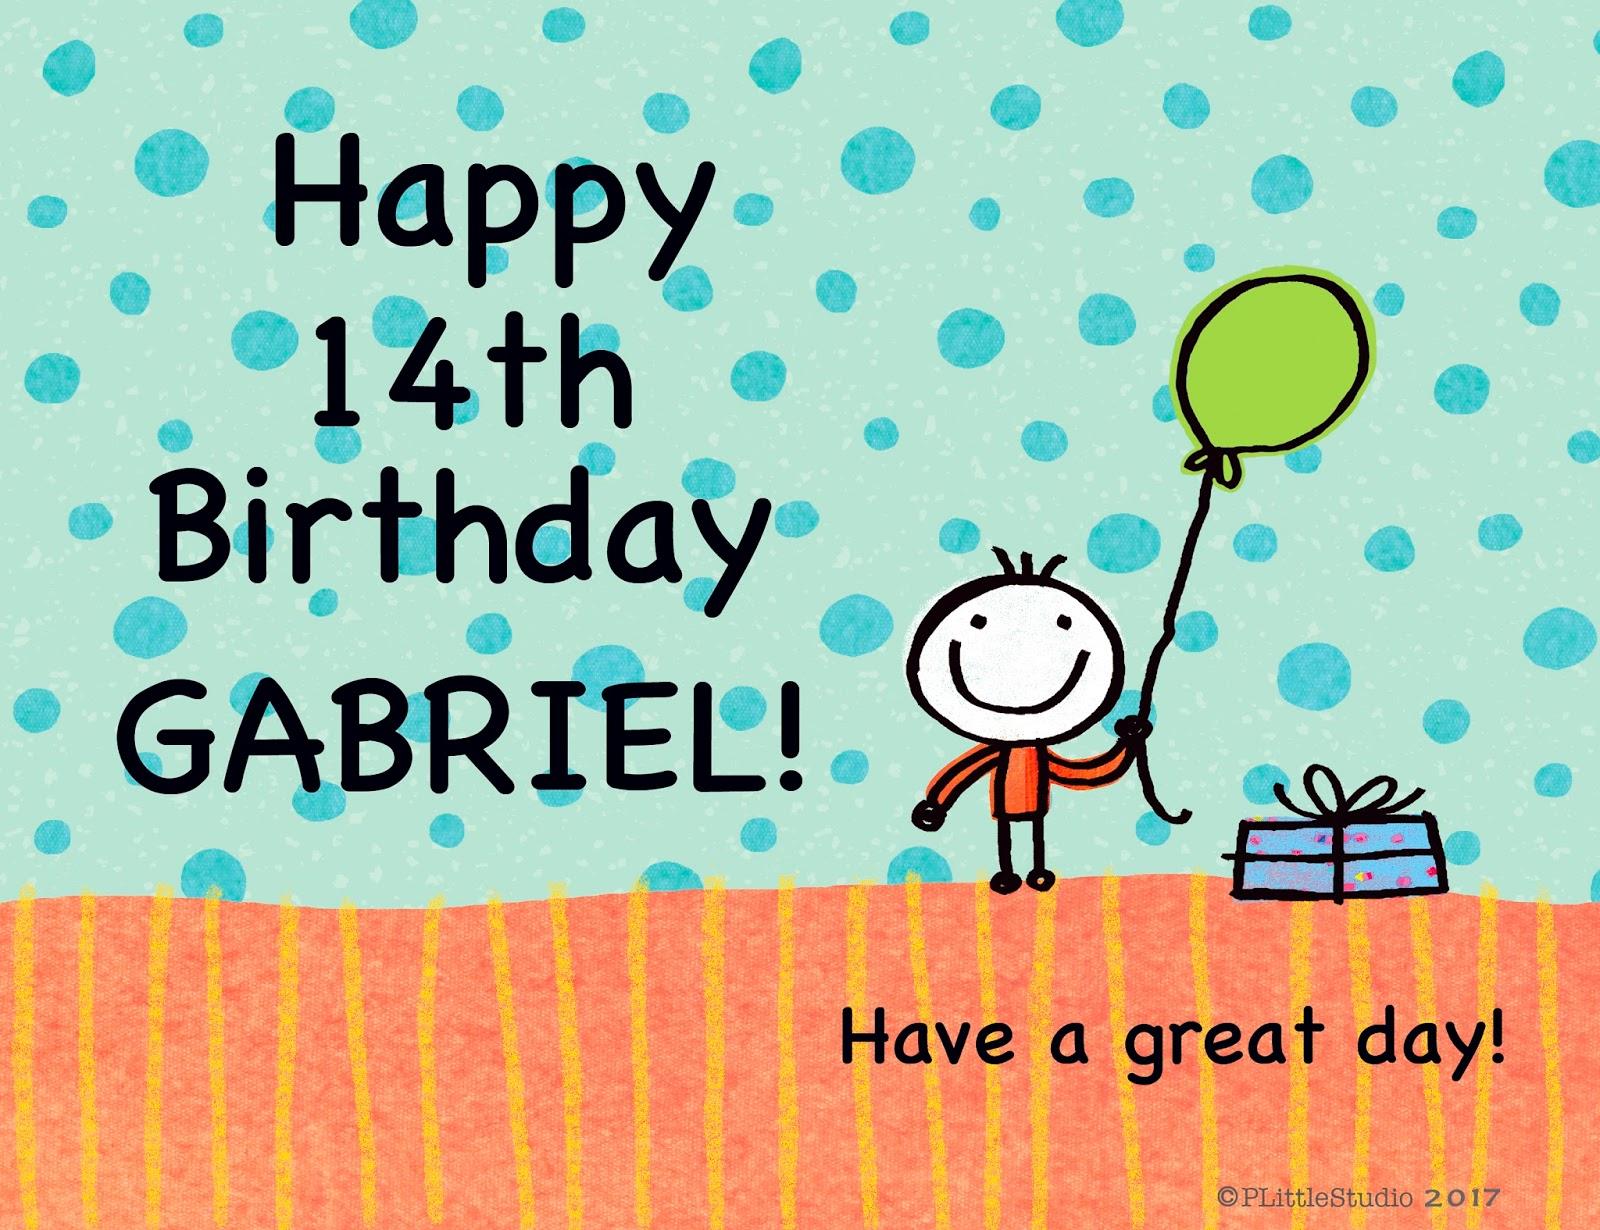 happy birthday gabe P Little Studio: HAPPY BIRTHDAY GABRIEL! happy birthday gabe